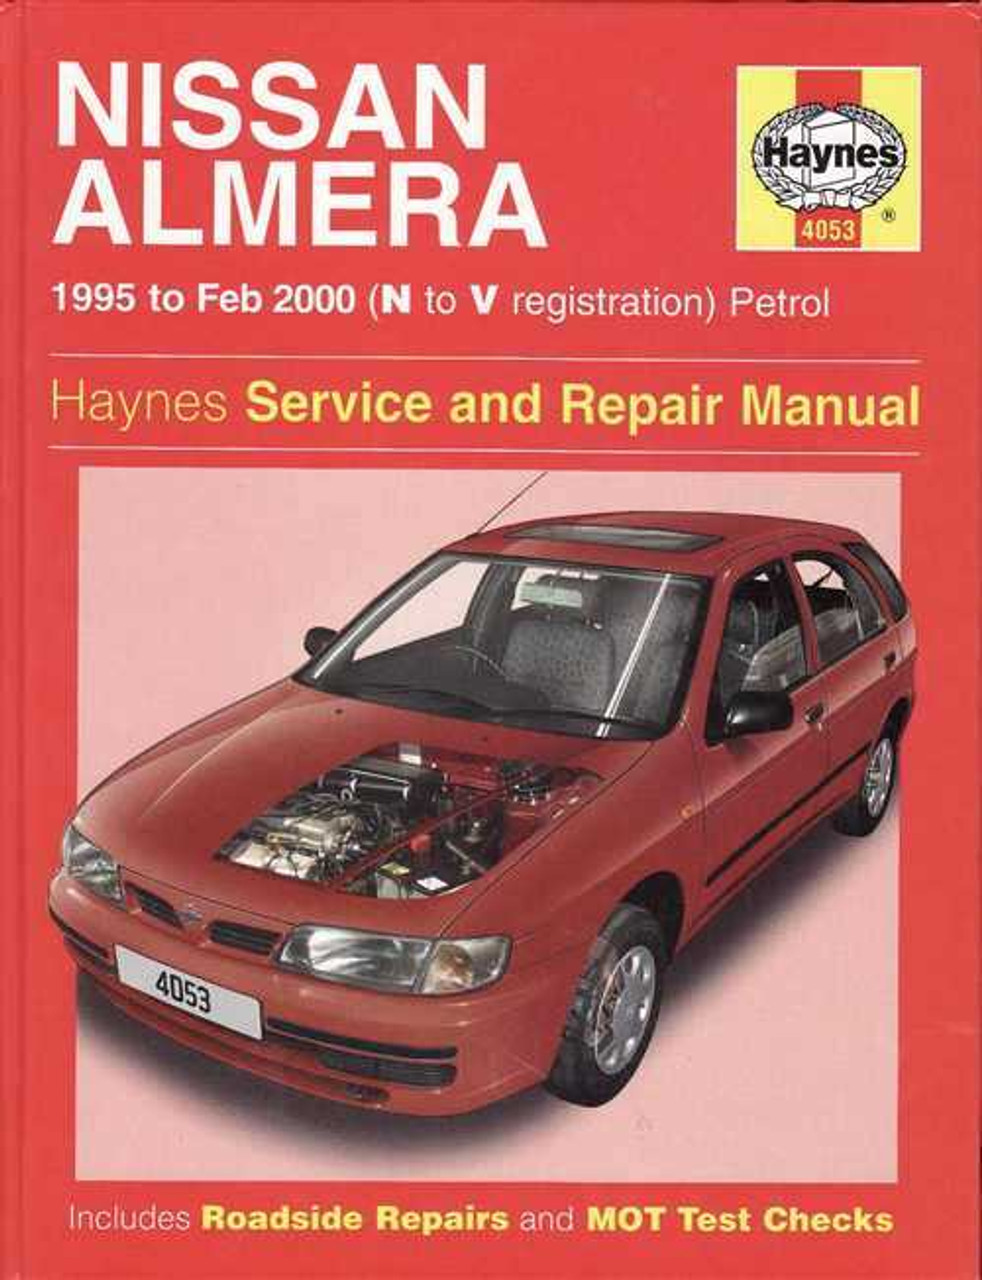 nissan almera pulsar n15 1995 2000 workshop manual rh automotobookshop com au nissan pulsar n16 repair manual pdf 1987 Nissan Pulsar